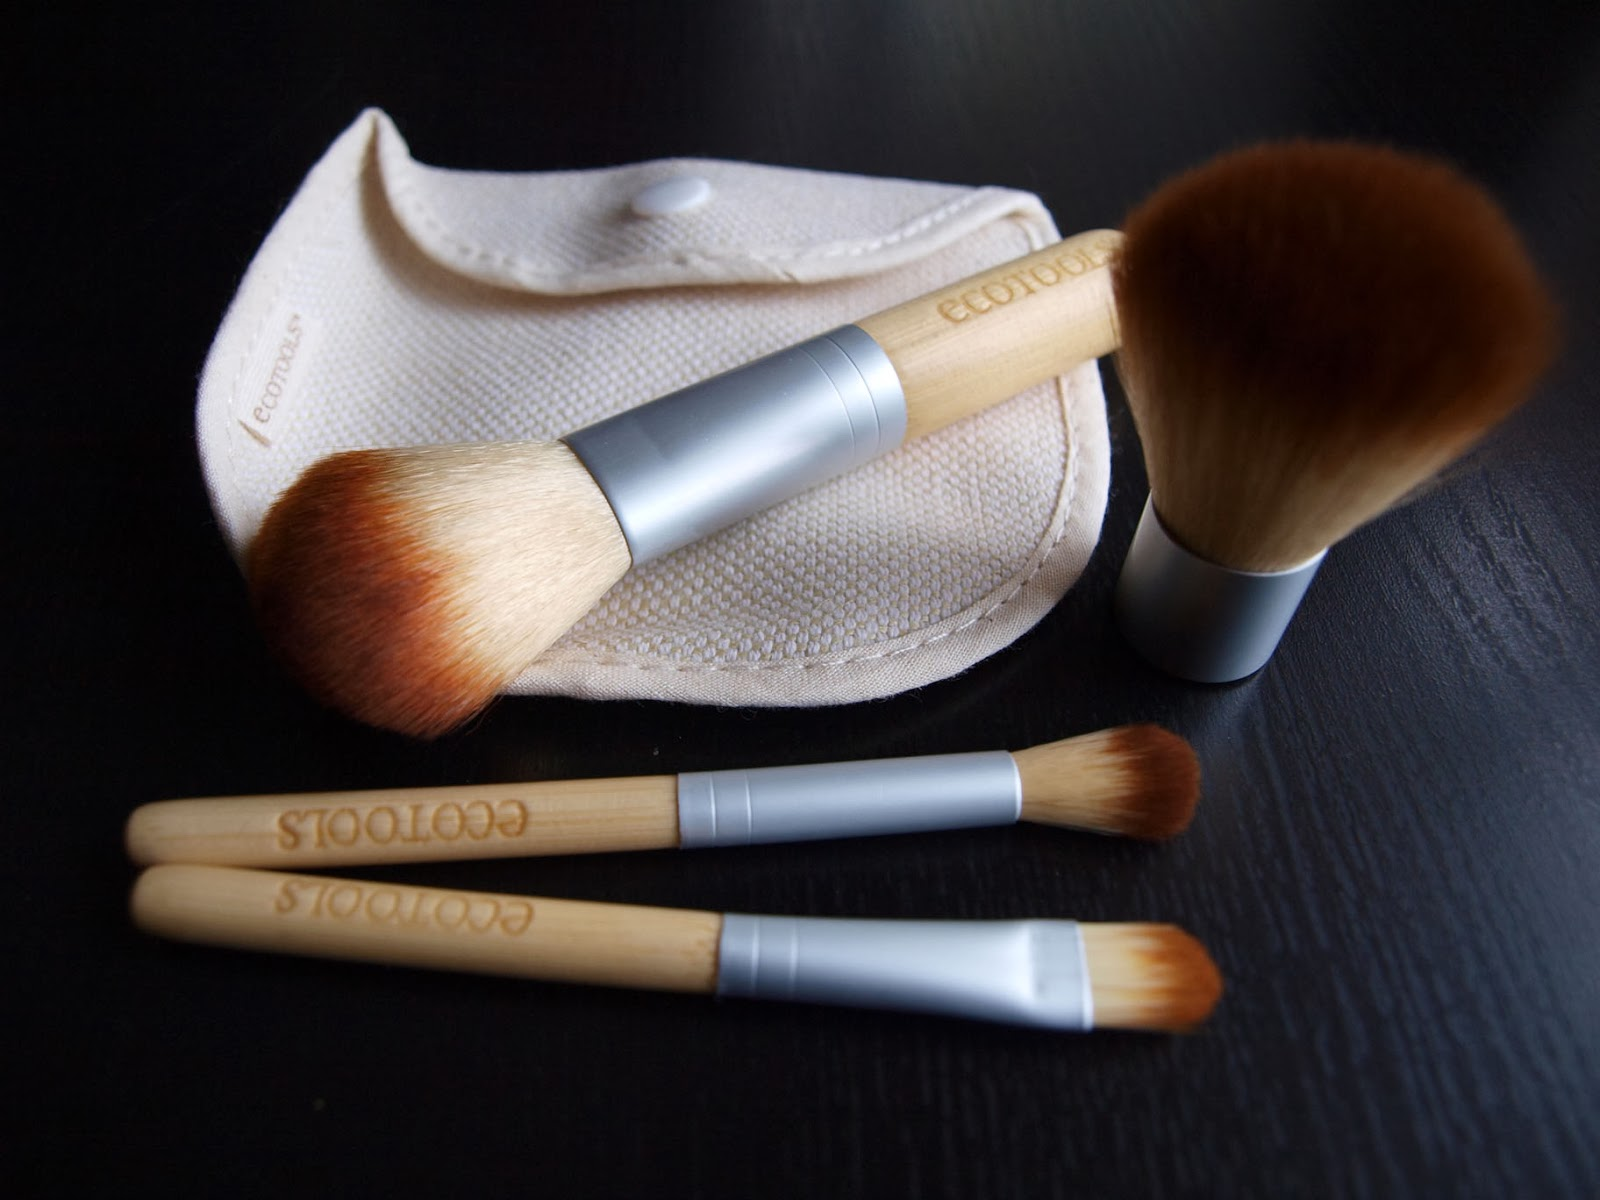 Pedido buyincoins haul review brochas ecotools makeup brush